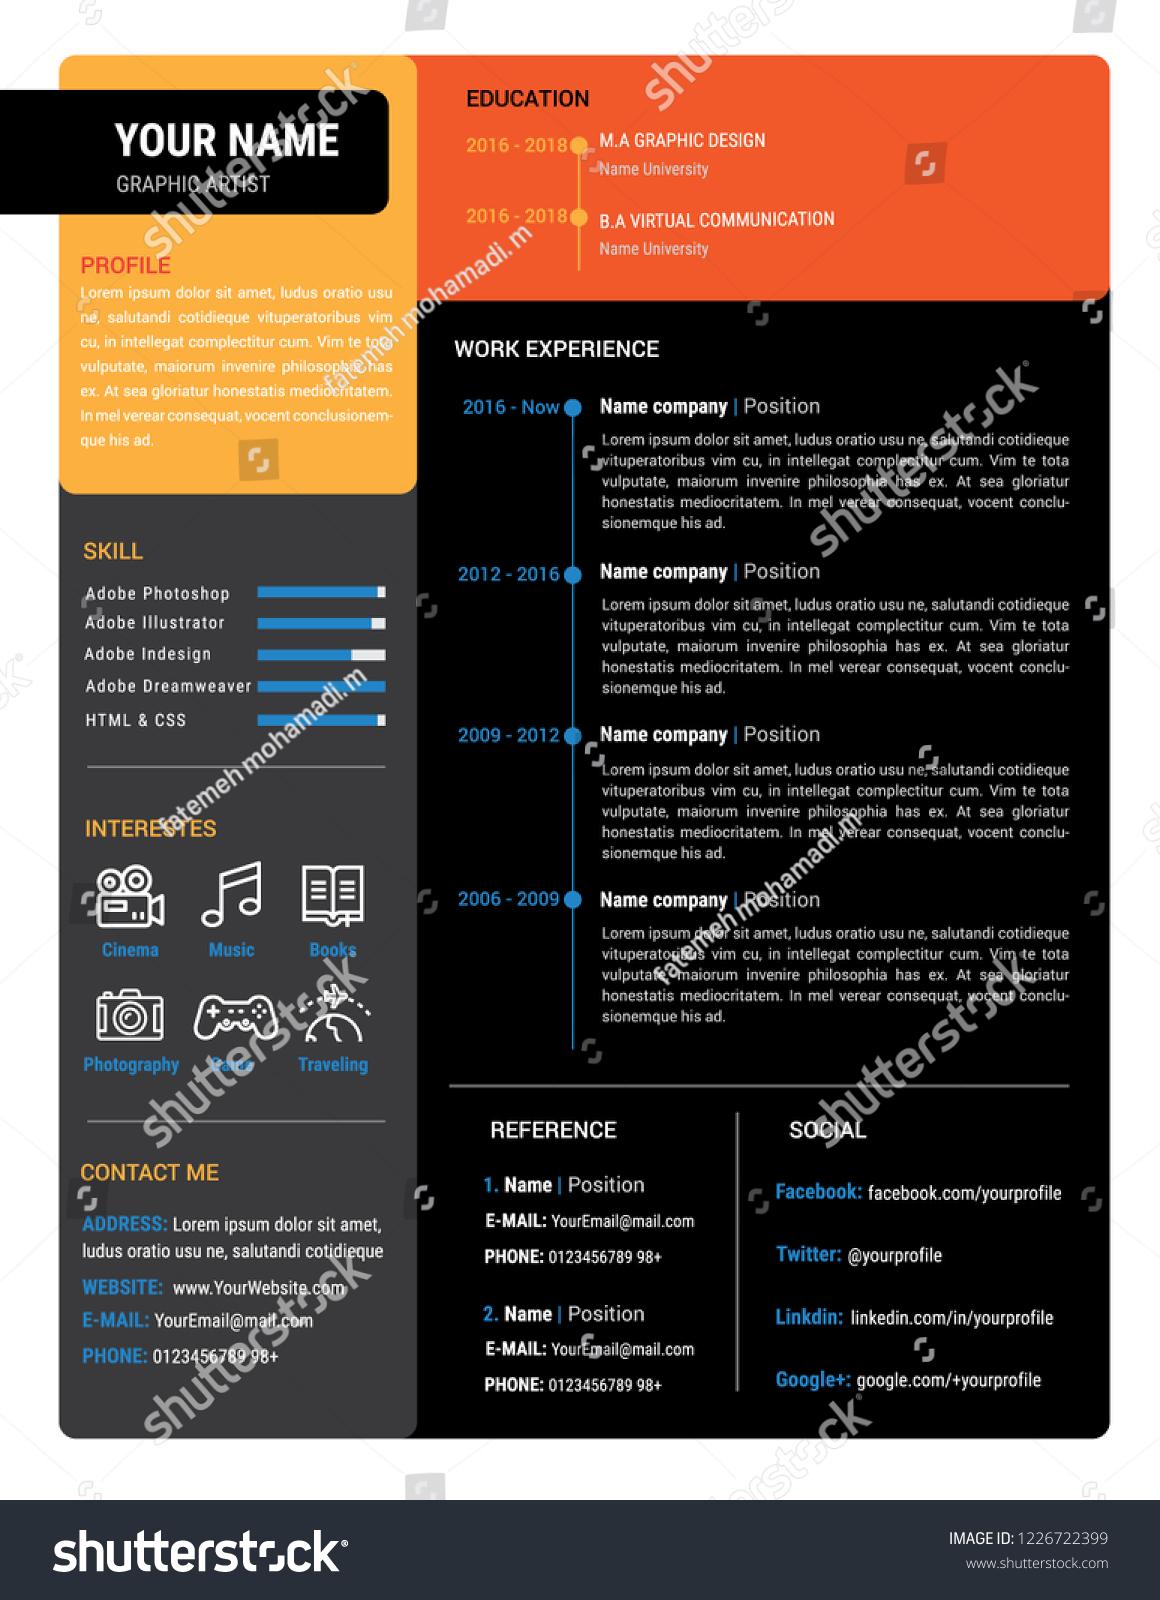 adobe stock resume templates